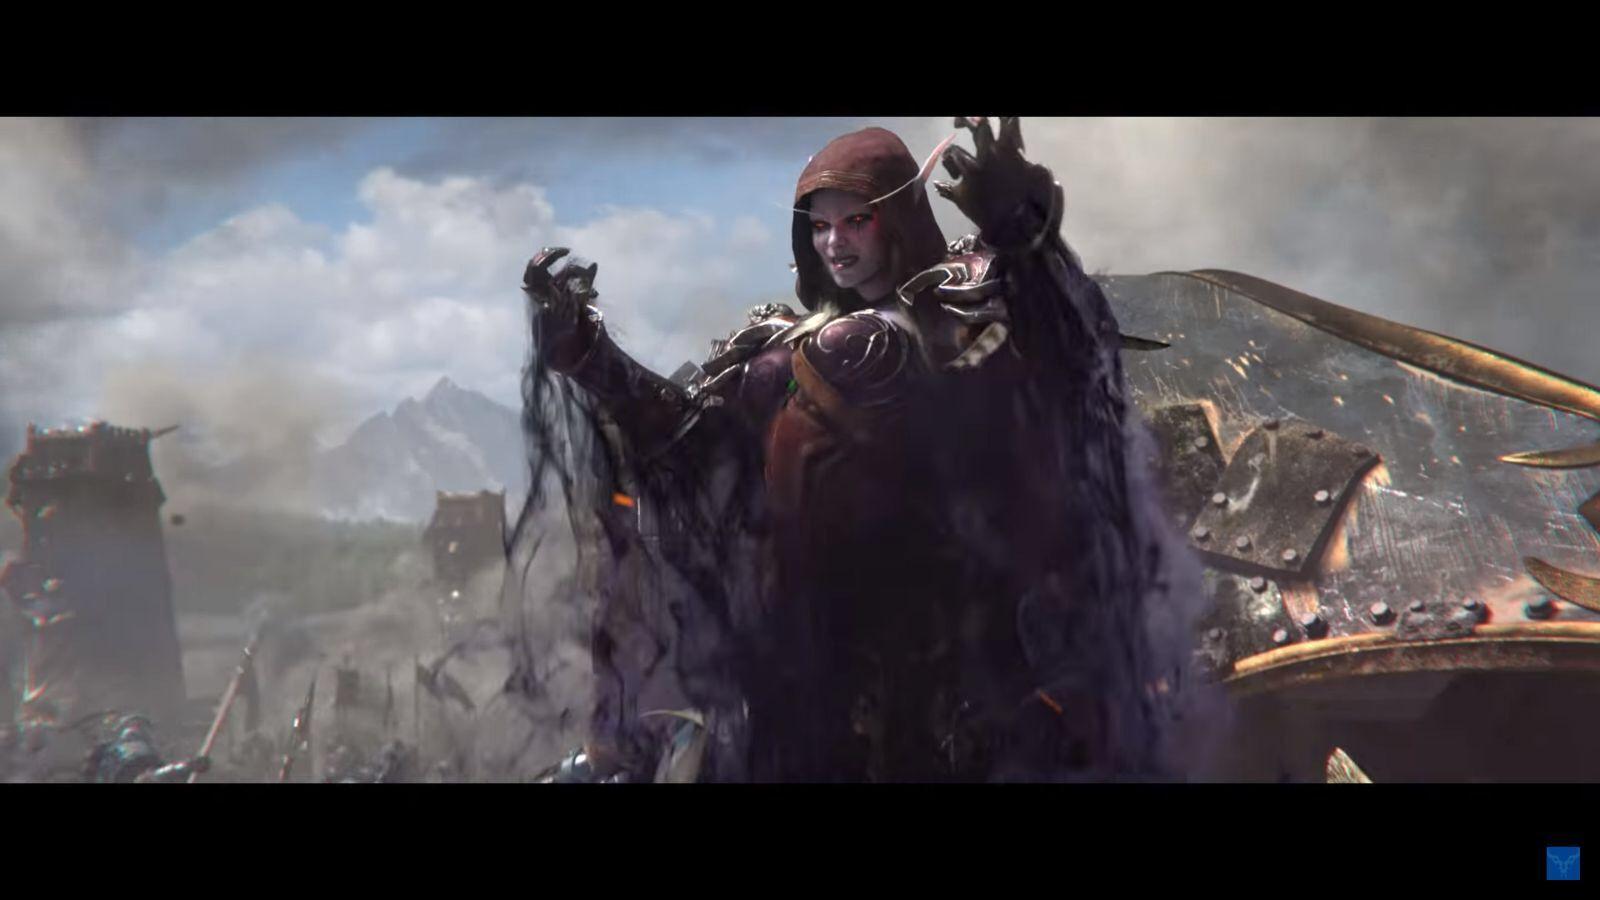 Battle For Azeroth Sylvanas Windrunner World Of Warcraft Azeroth